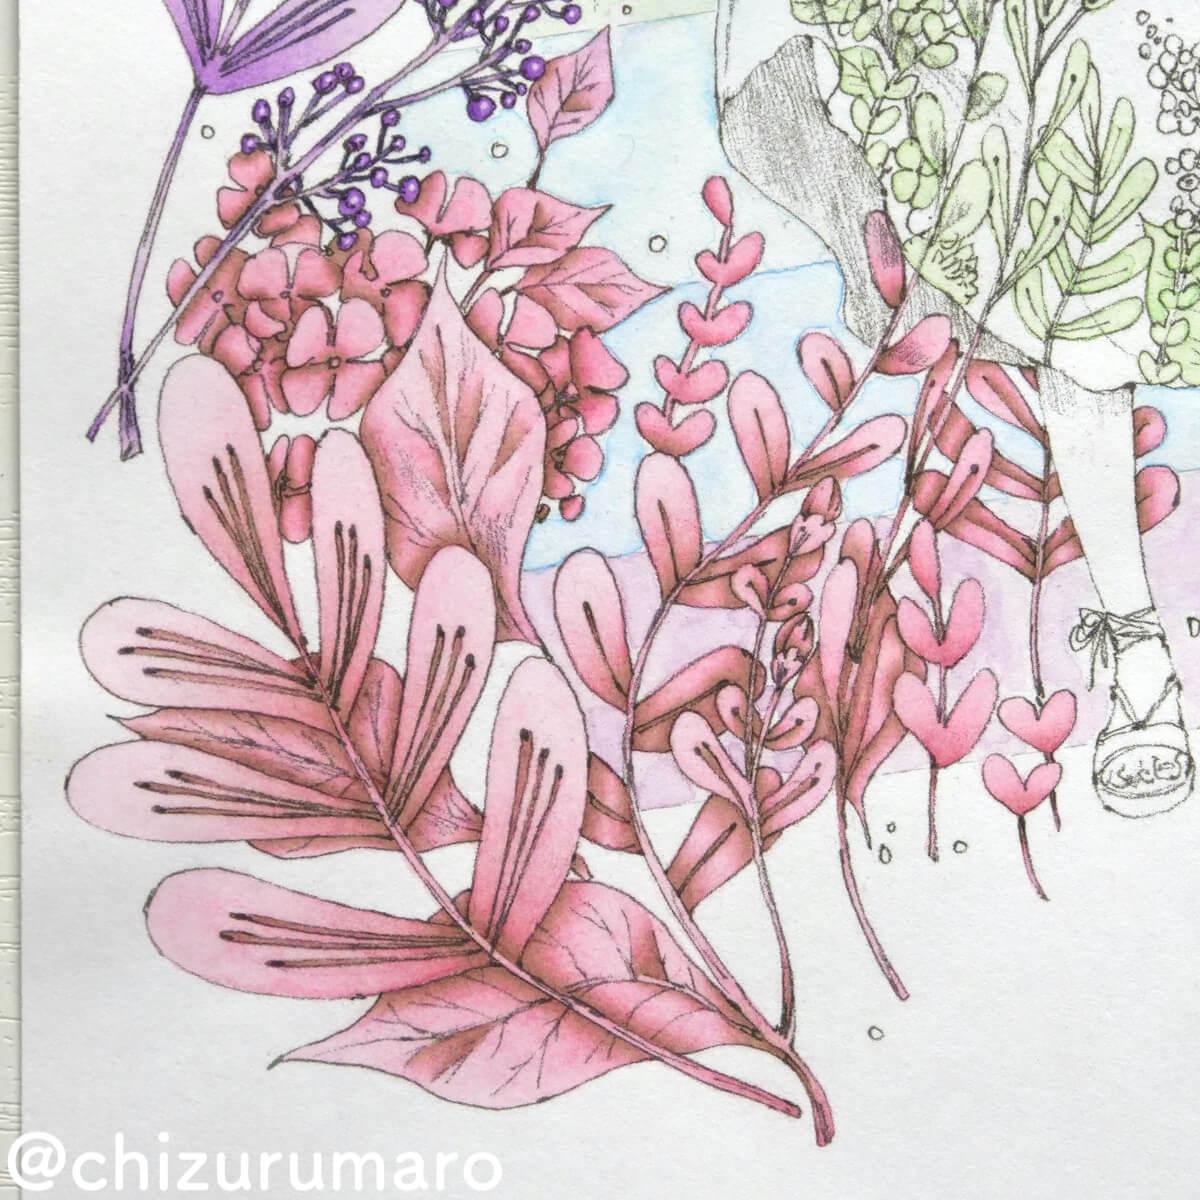 f:id:chizurumaro:20210612164432j:plain